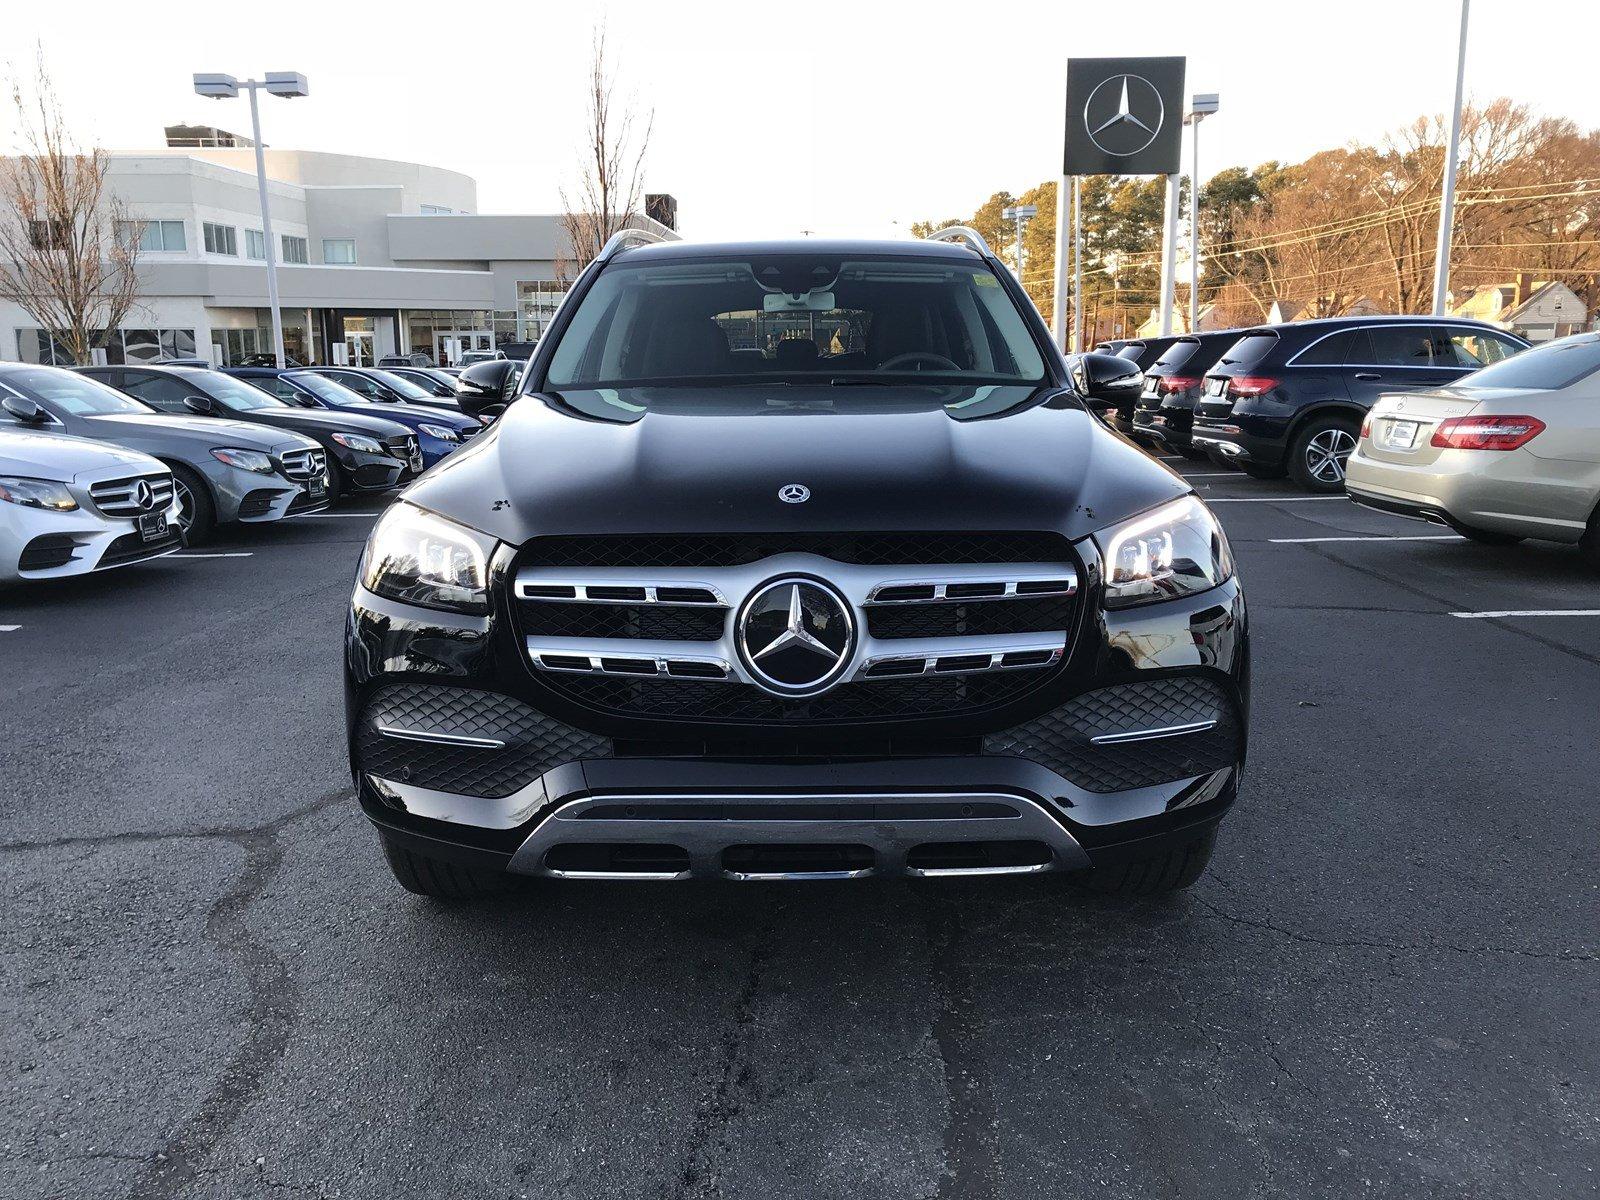 2020 Black Mercedes-Benz GLS